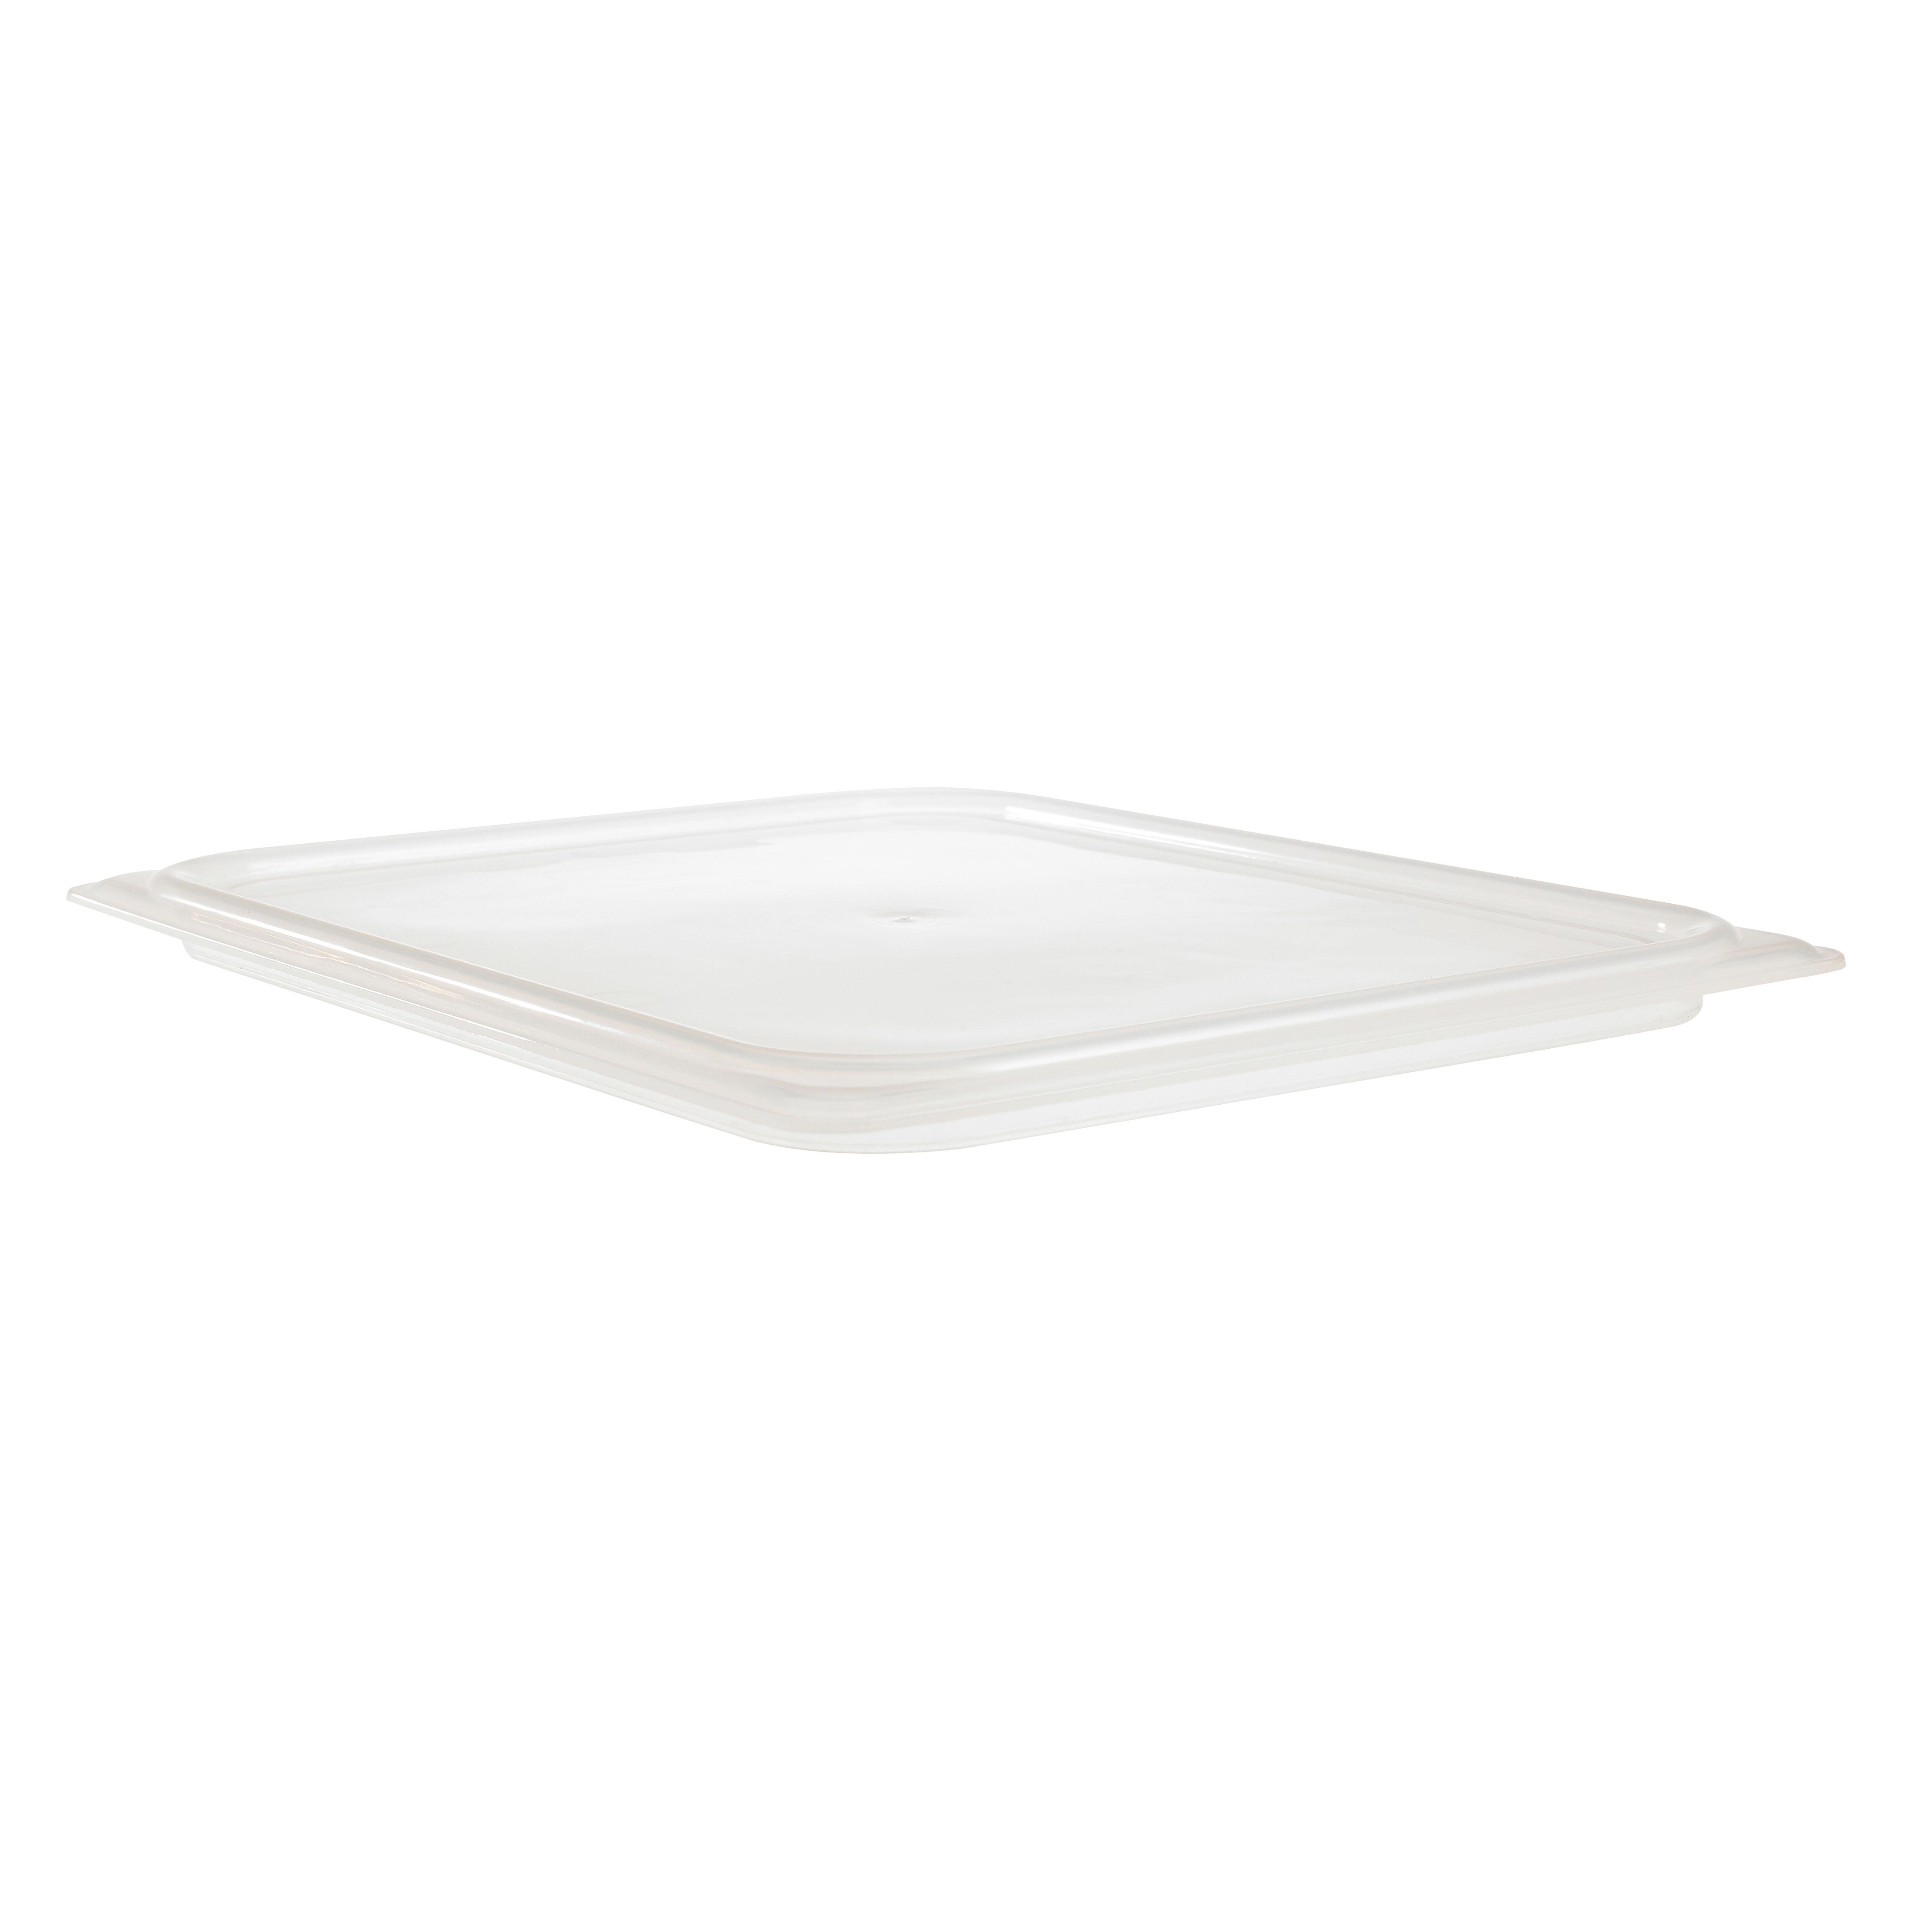 2410-06 Cambro 20PPCWSC190 food pan cover, plastic